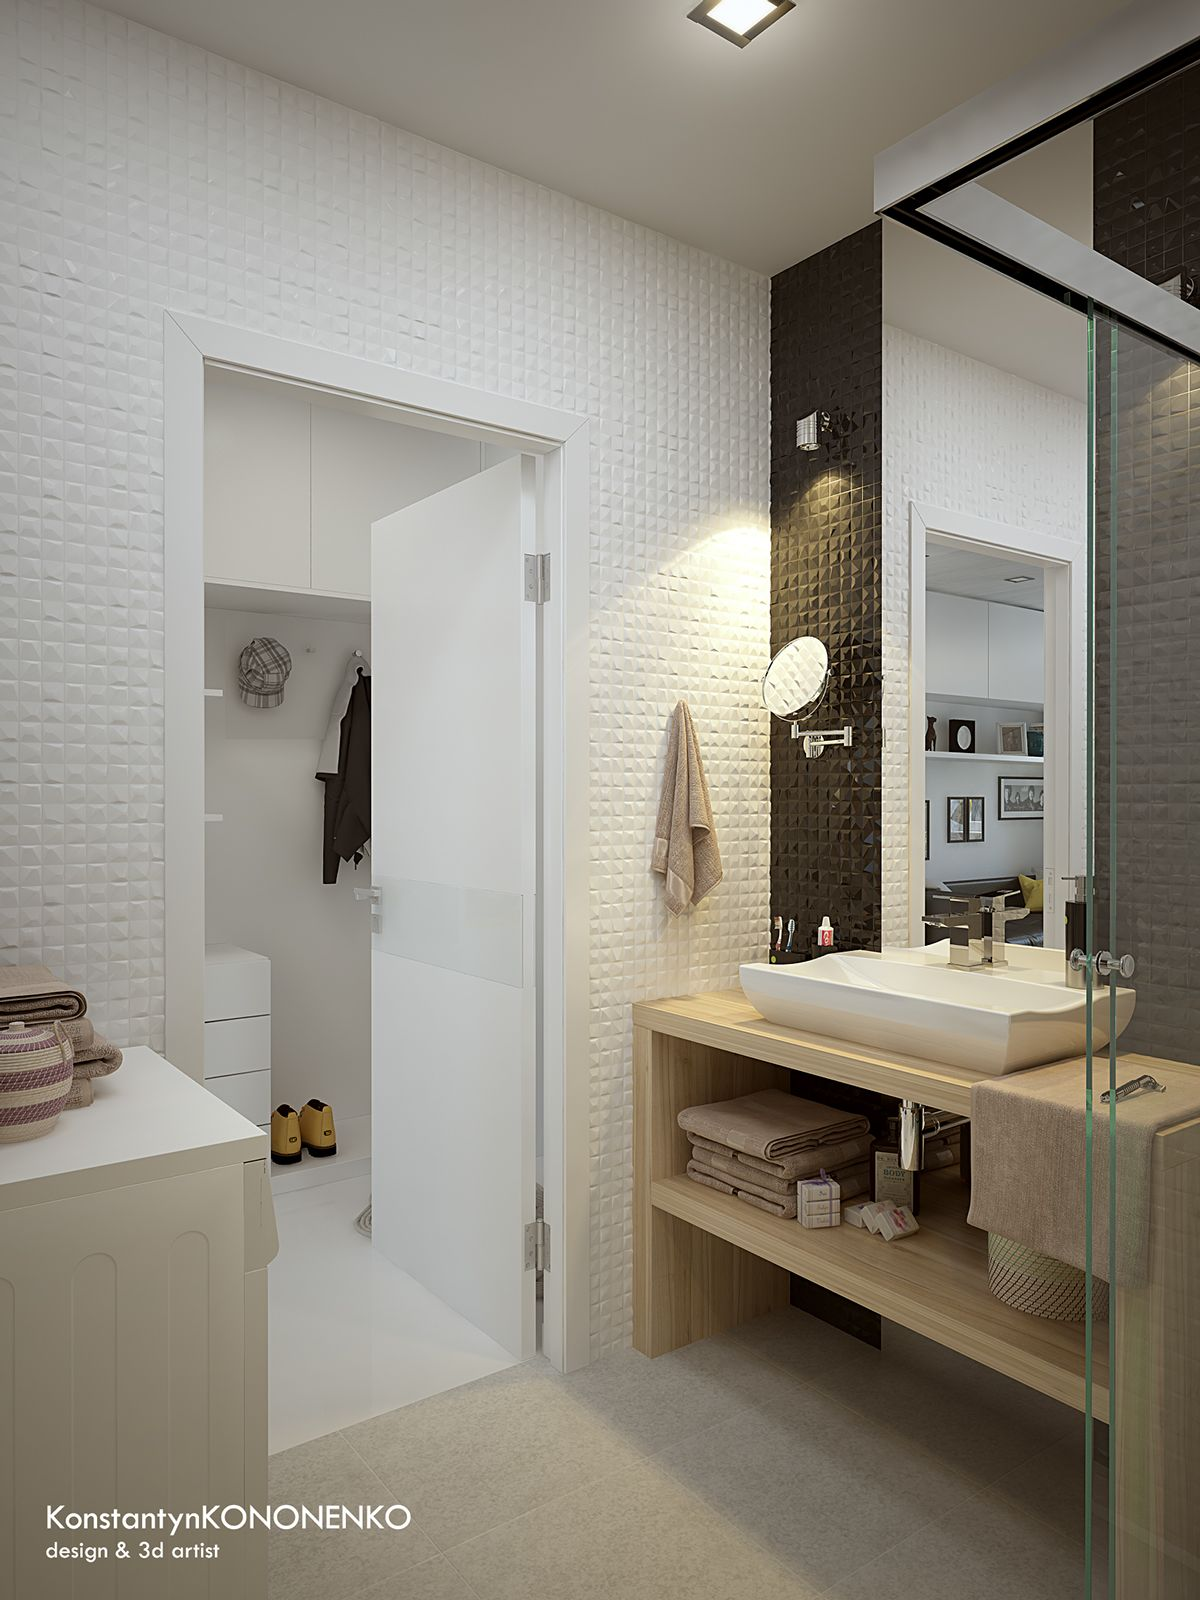 5 Apartment Designs Under 500 Square Feet Open Plan Bathroom Design Modern Bathroom Design Apartment Design